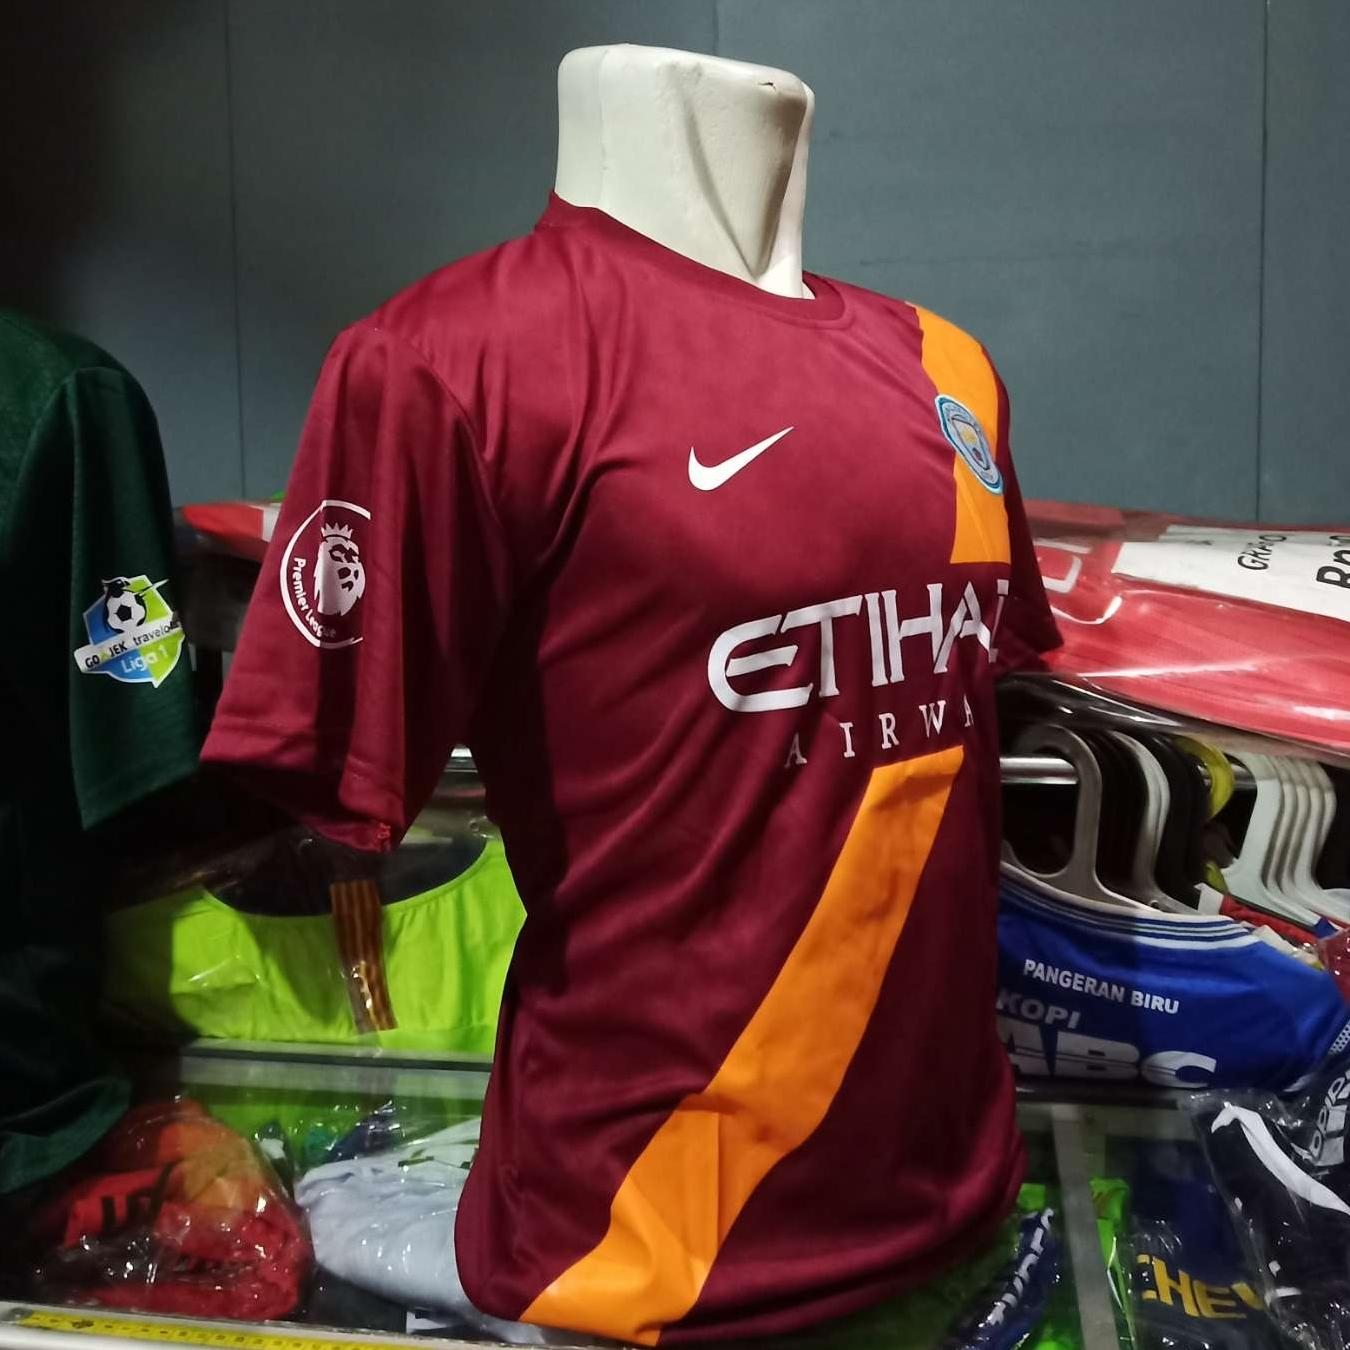 f1ffeee5265 Features Jersey Kaos Baju Bola Mam Citi 3rd Dan Harga Terbaru ...